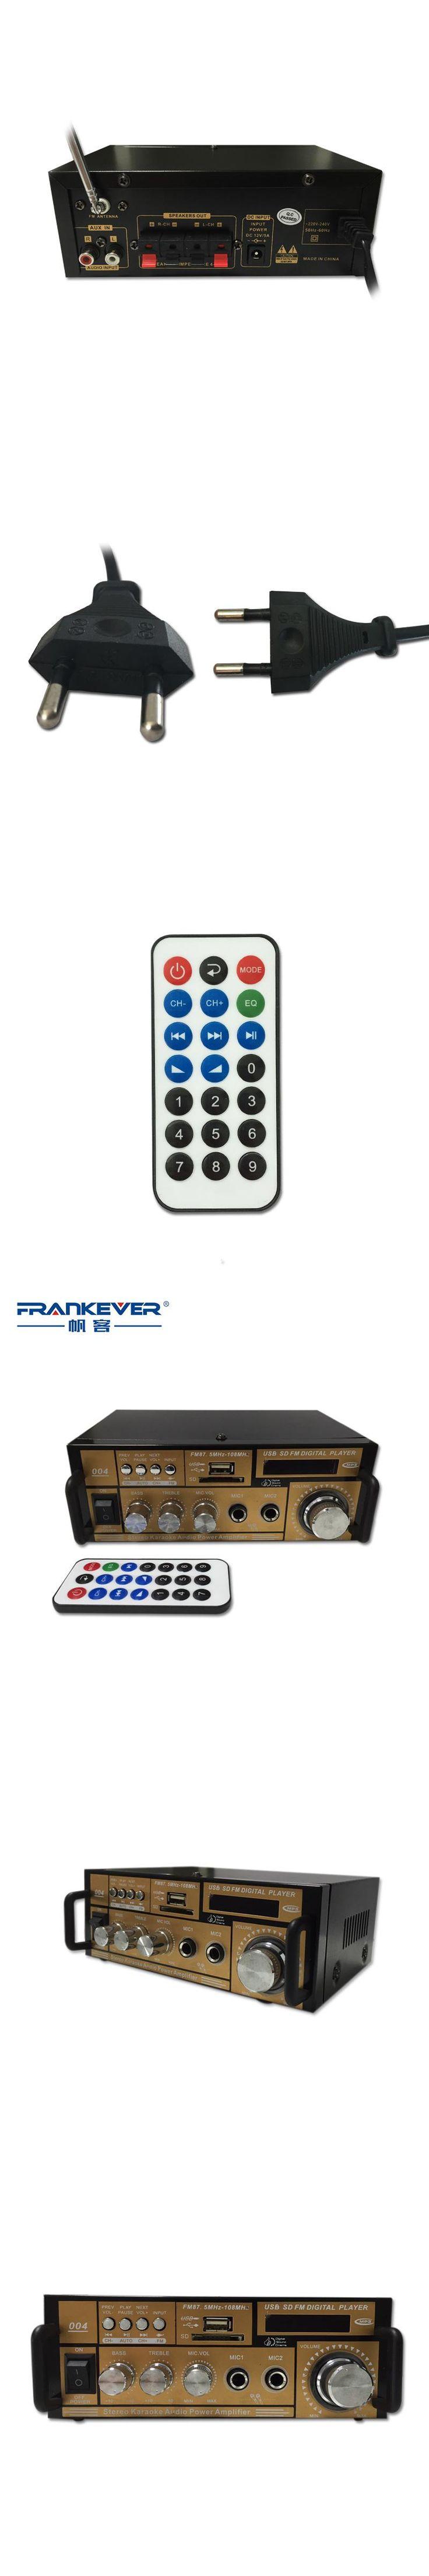 Frankever Hi Fi Digital Audio Car Amplifier Home Amplifier 2.1 High Quality DC12V AC220V-240V Professional Free shipping TELI004